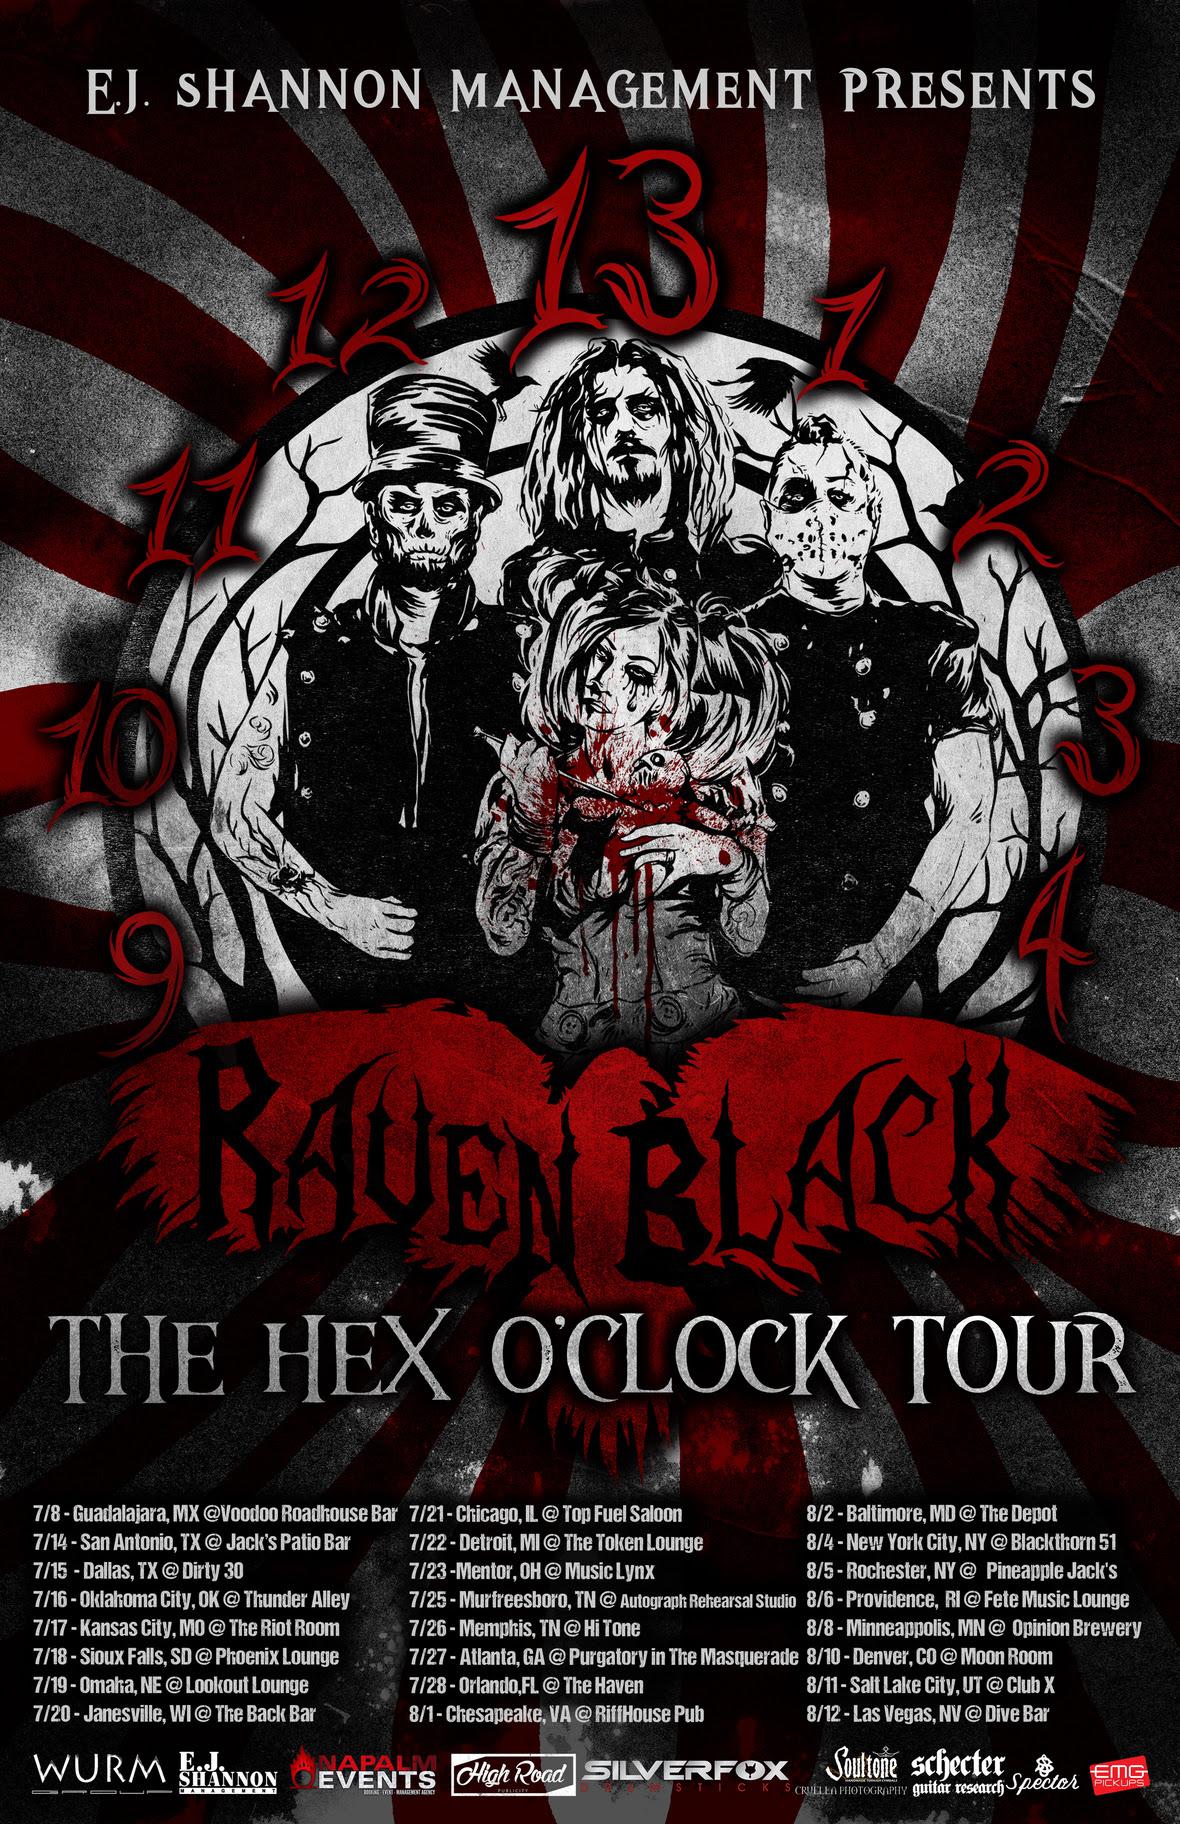 Raven Black Hexoclock